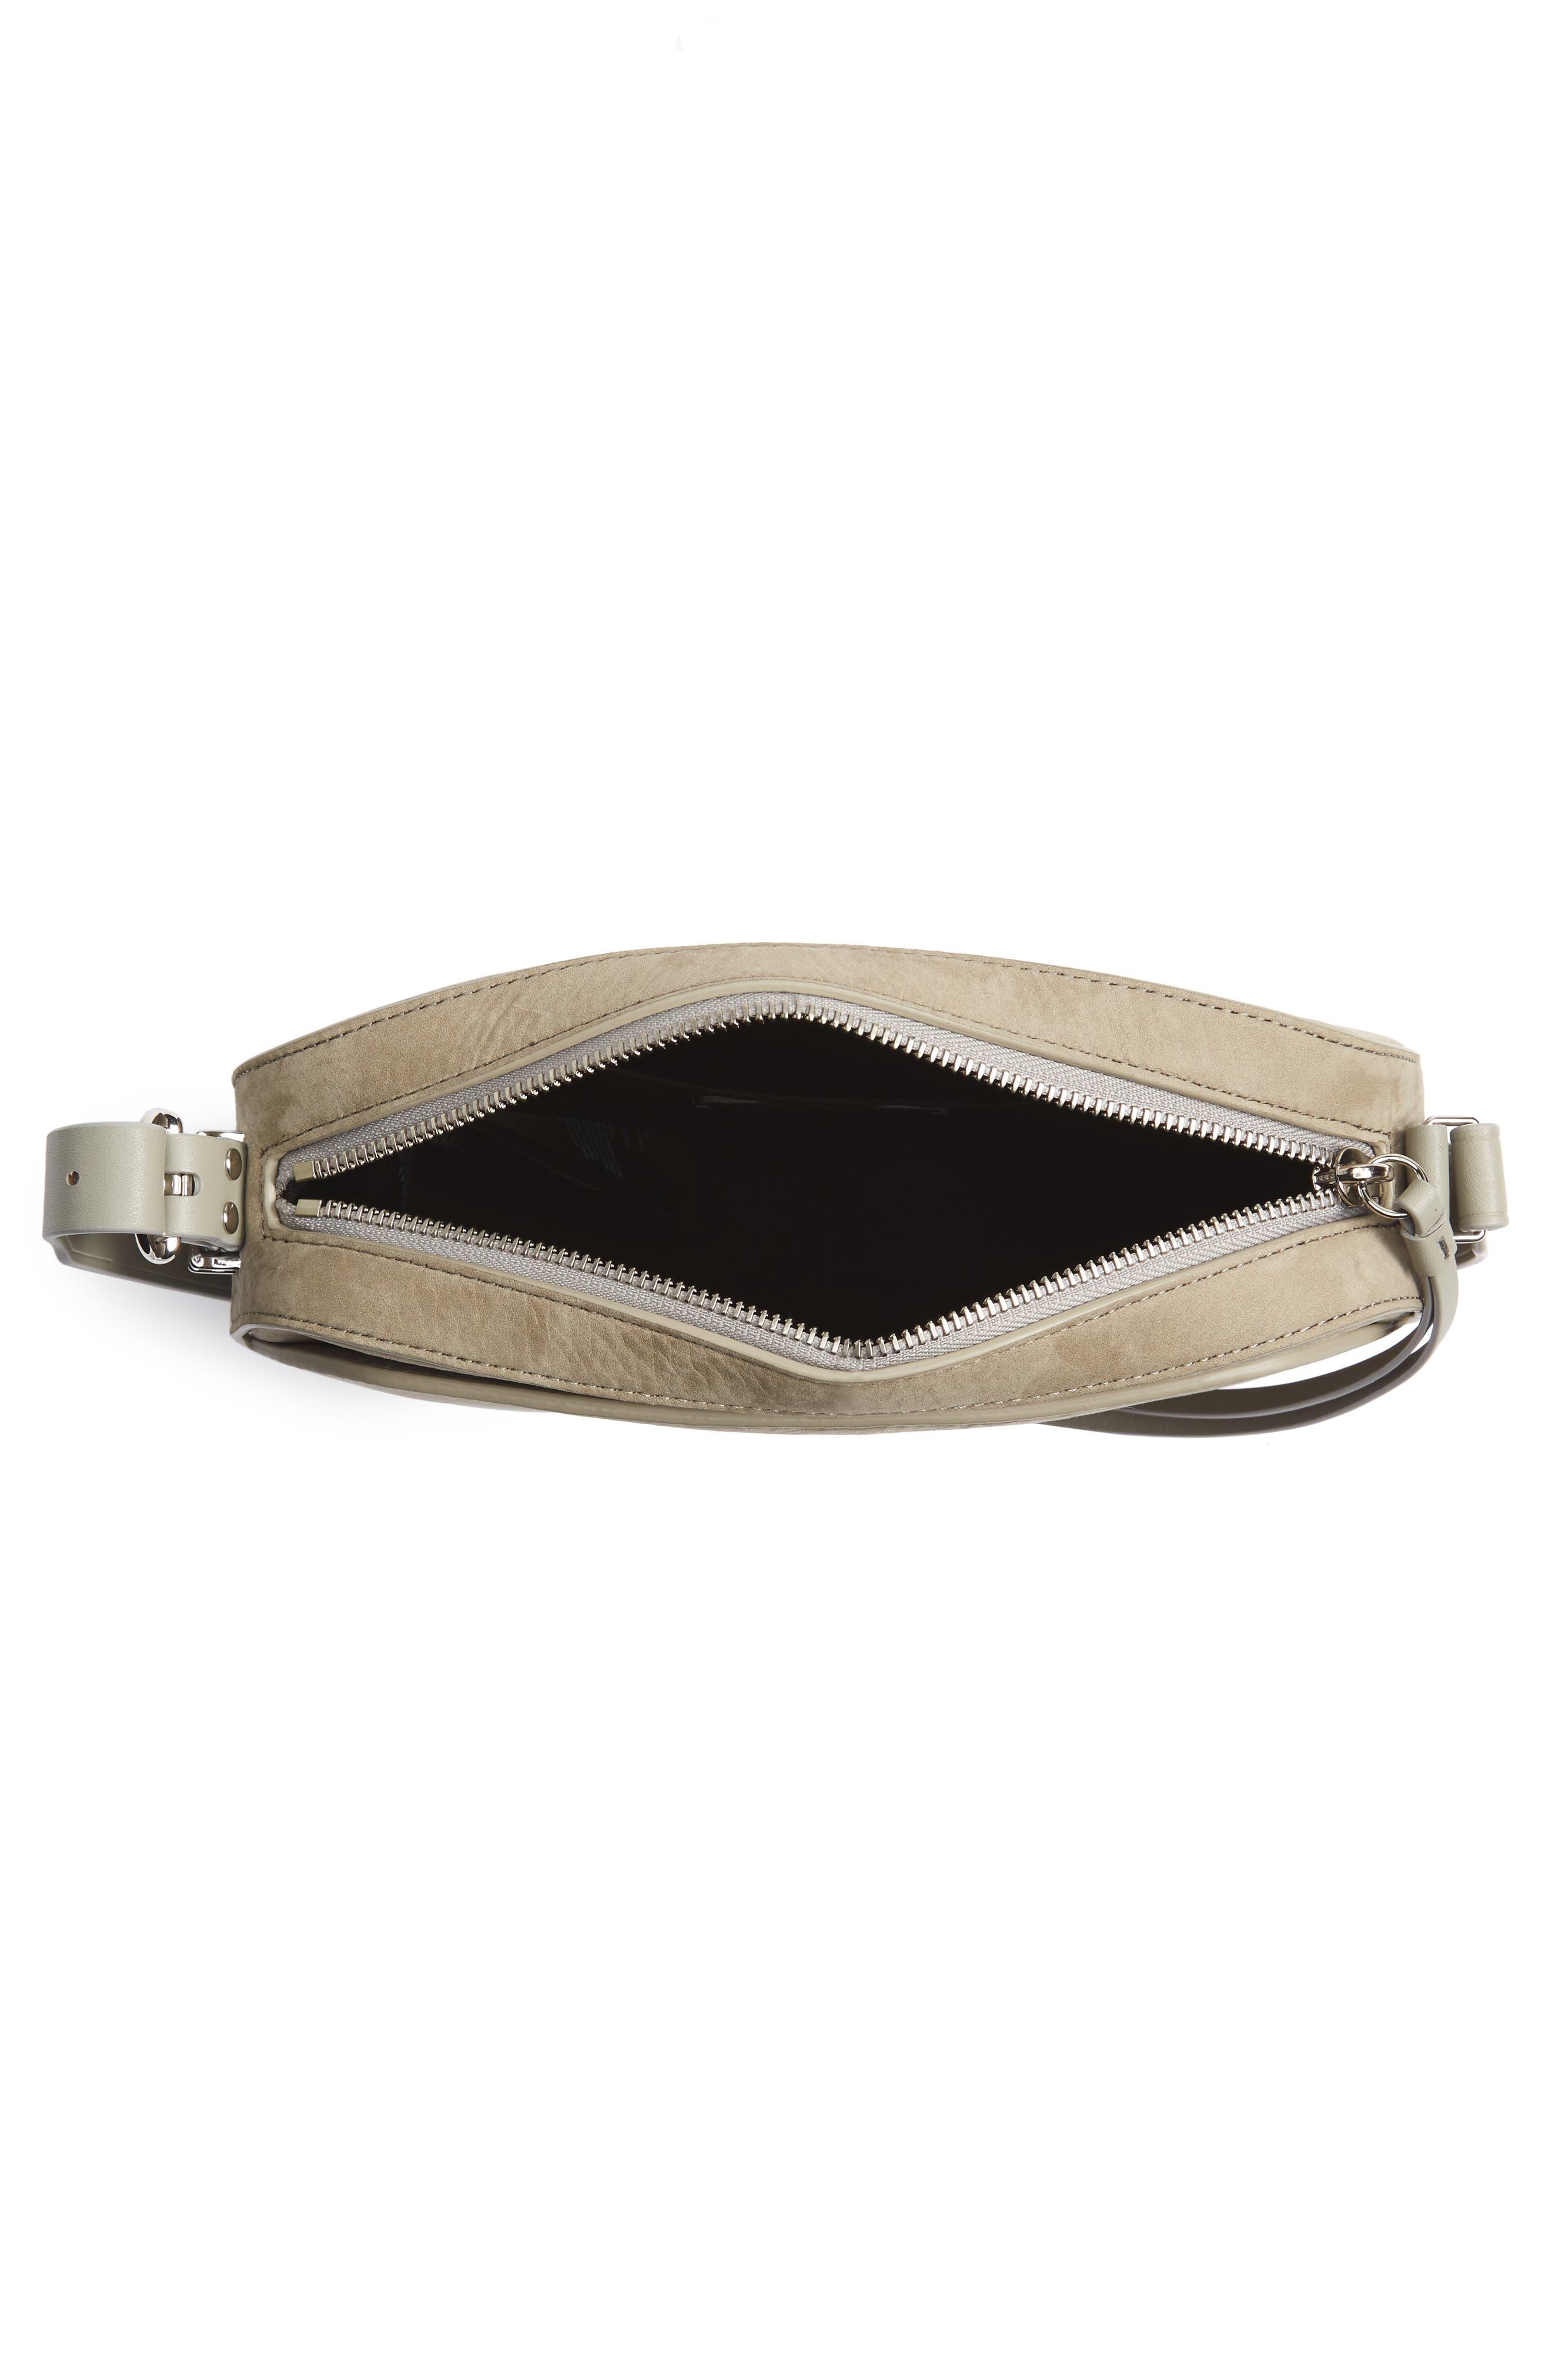 Cooper Nubuck Leather Shoulder Bag,                             Alternate thumbnail 4, color,                             Light Cement Grey